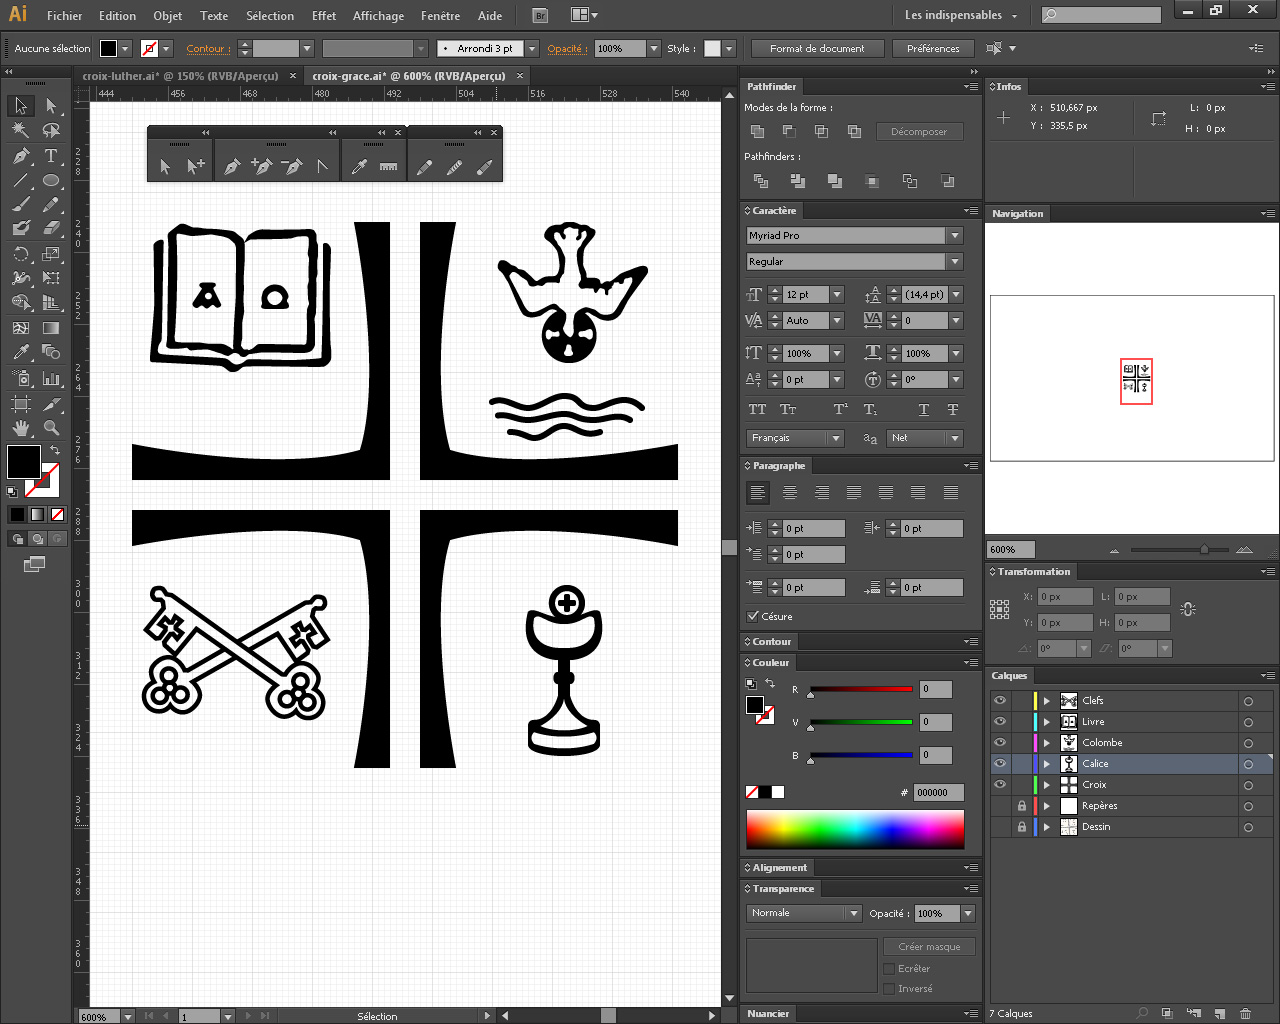 Reprise de la croix depuis Adobe Illustrator